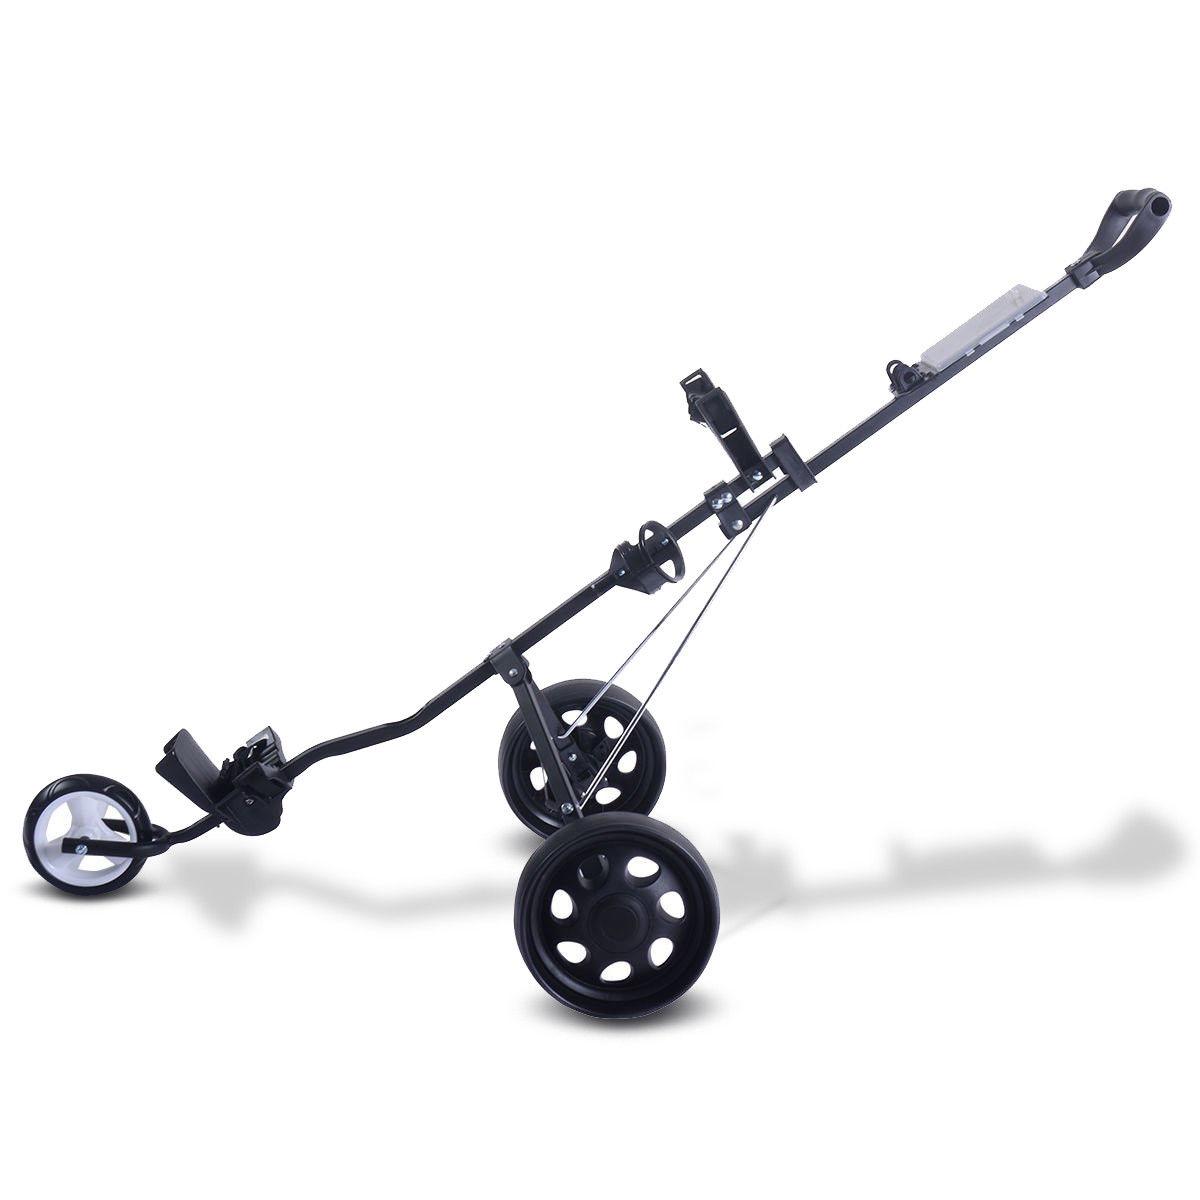 Folding Pull Push Golf Cart 3 Wheel Trolley